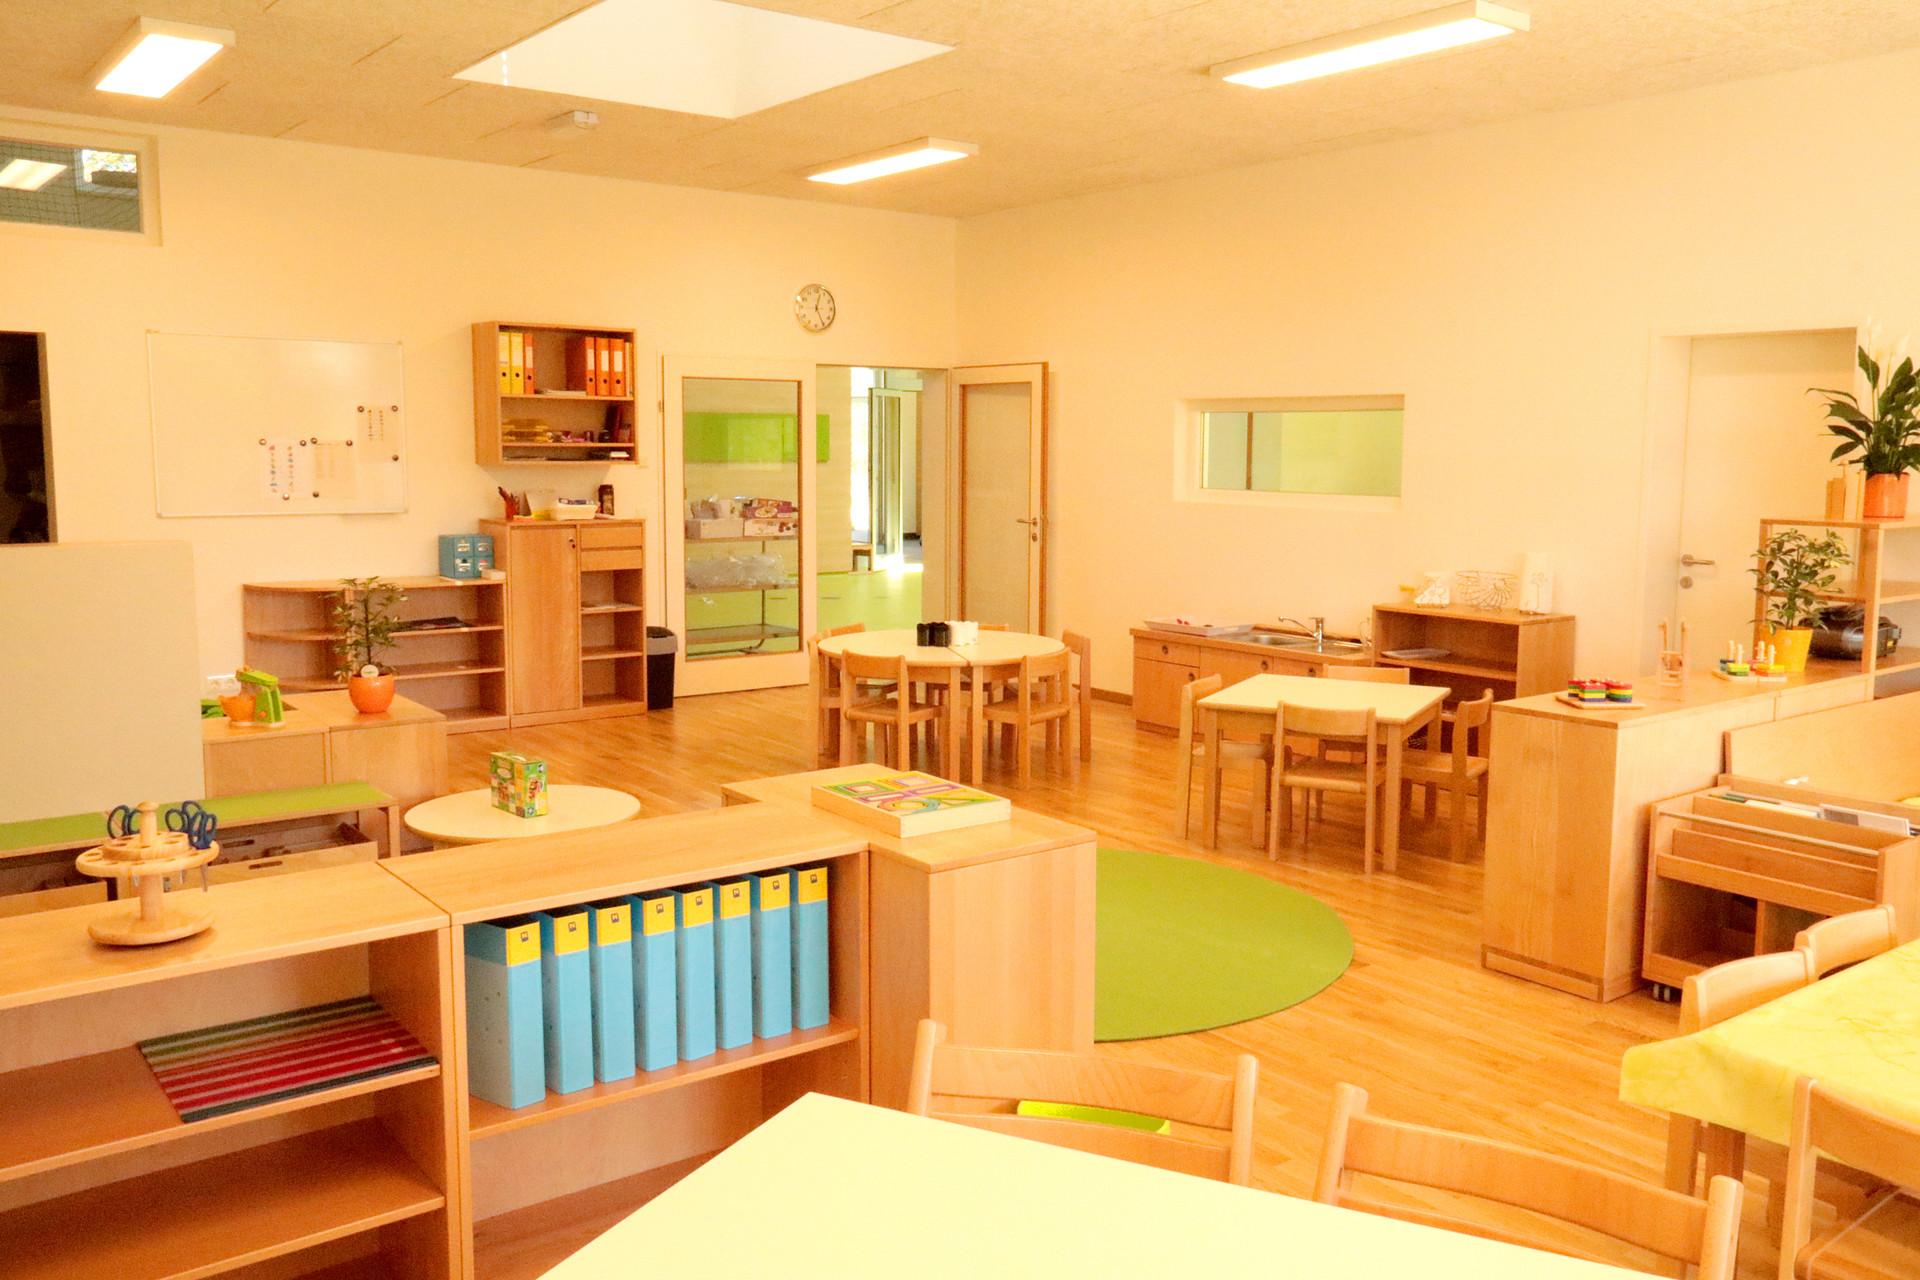 Kindergarten Mistelbach Nord (2).JPG